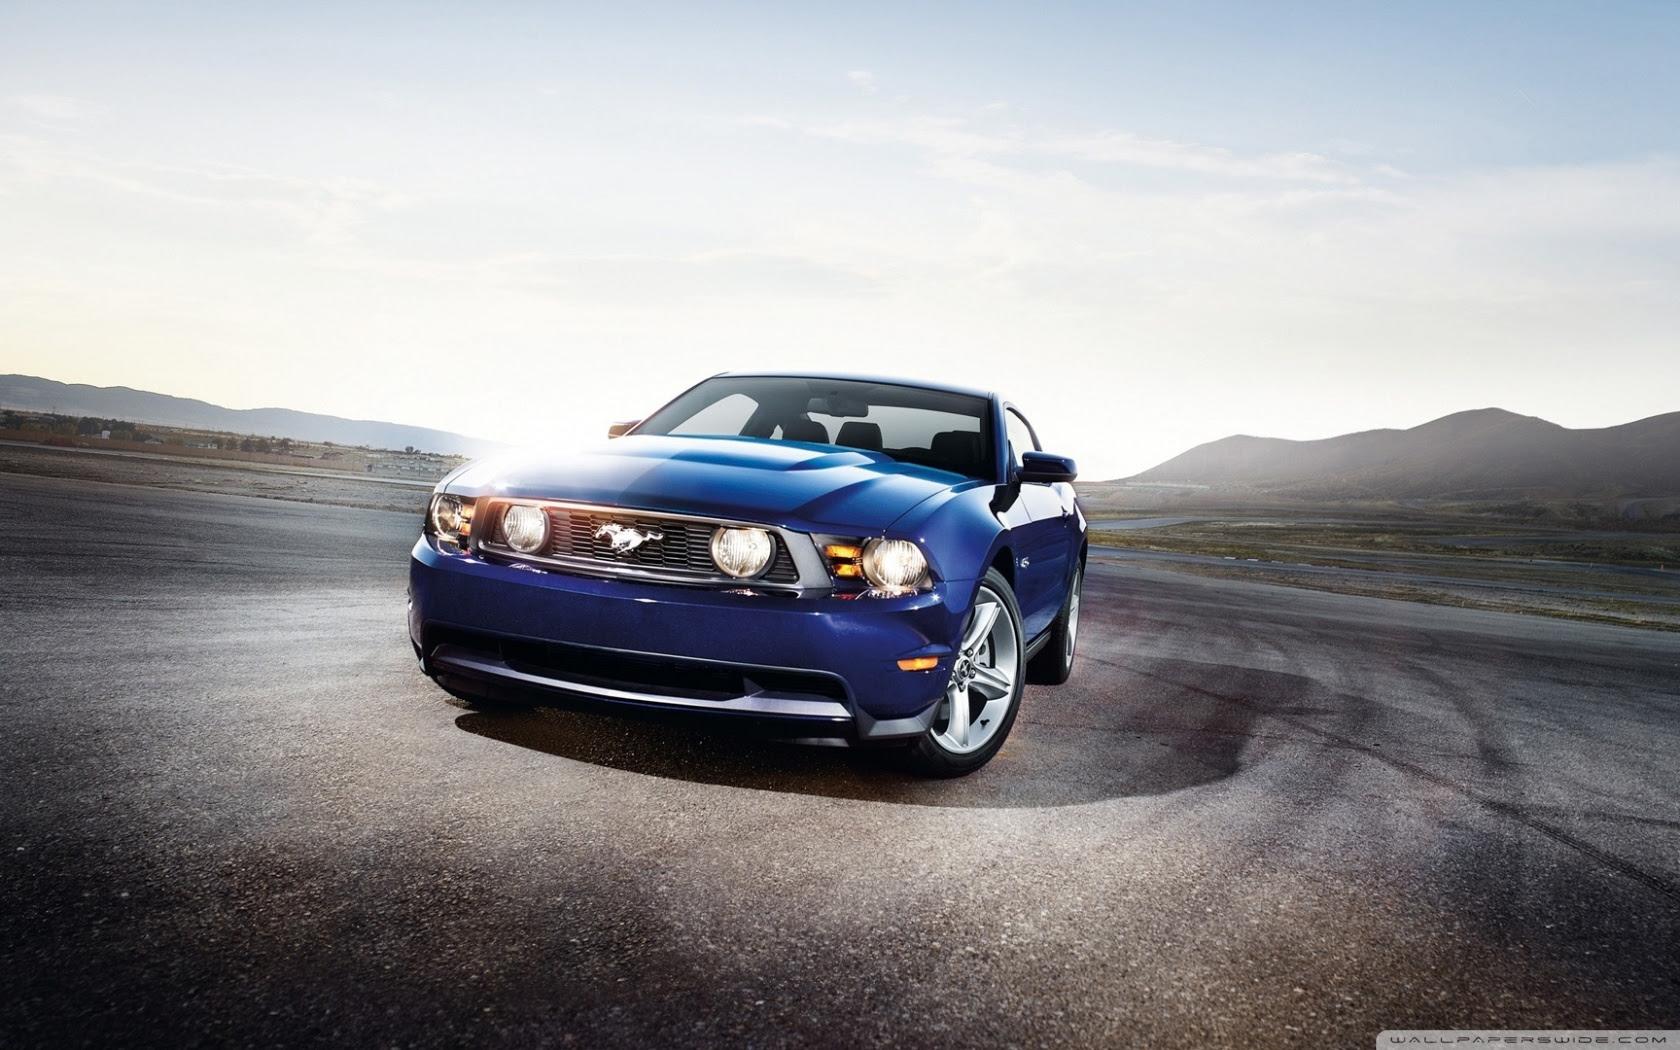 Mustang Shelby Gt500 Wallpaper 4K